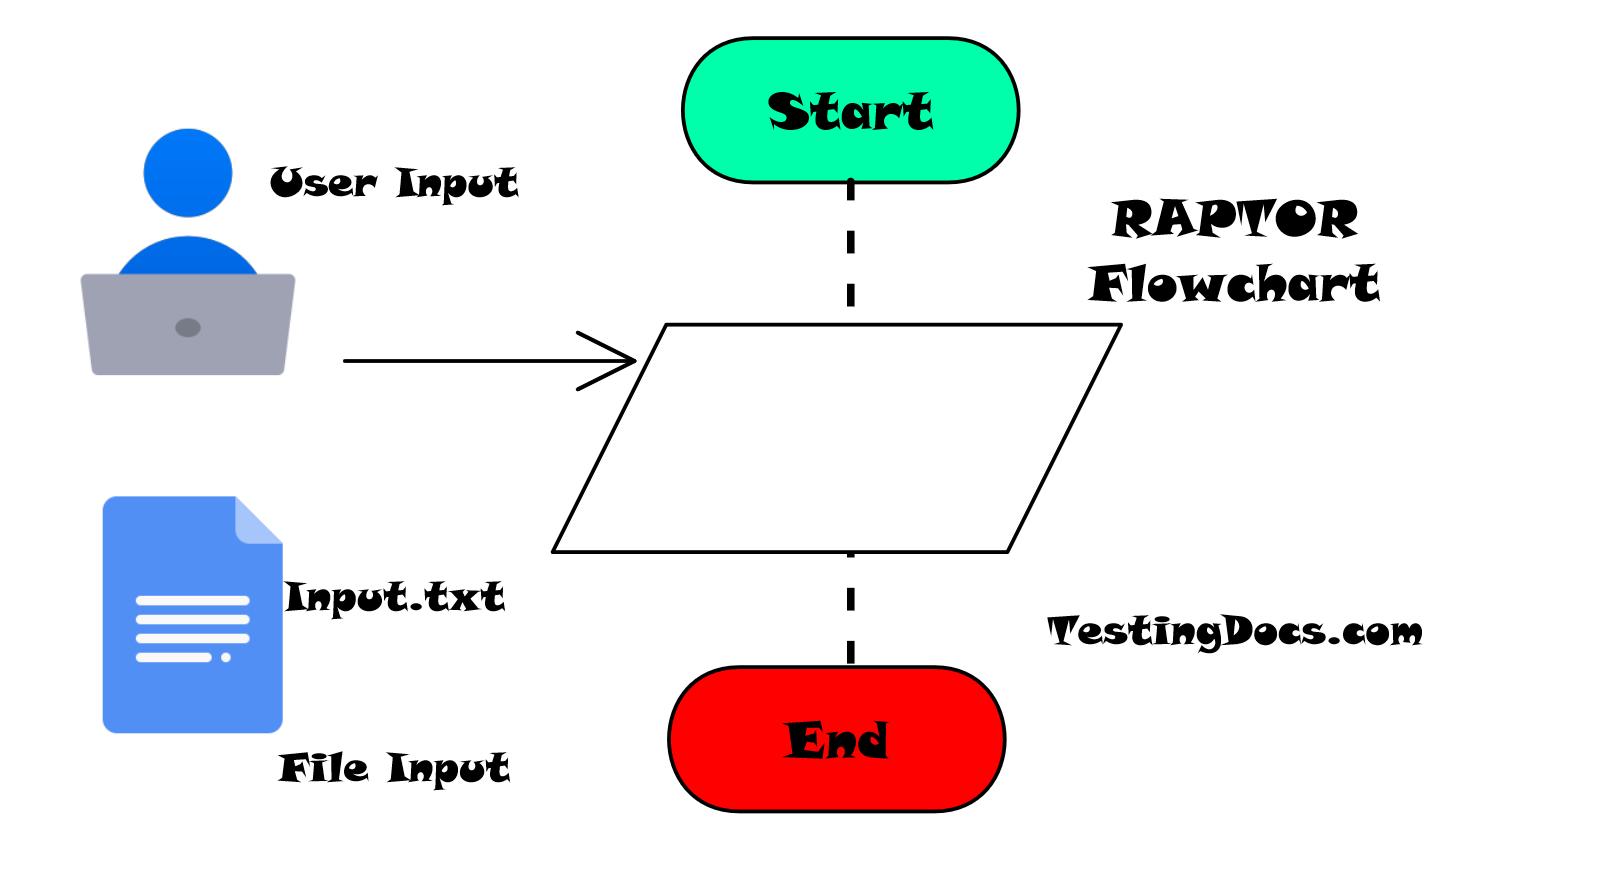 RAPTOR Flowchart Input File